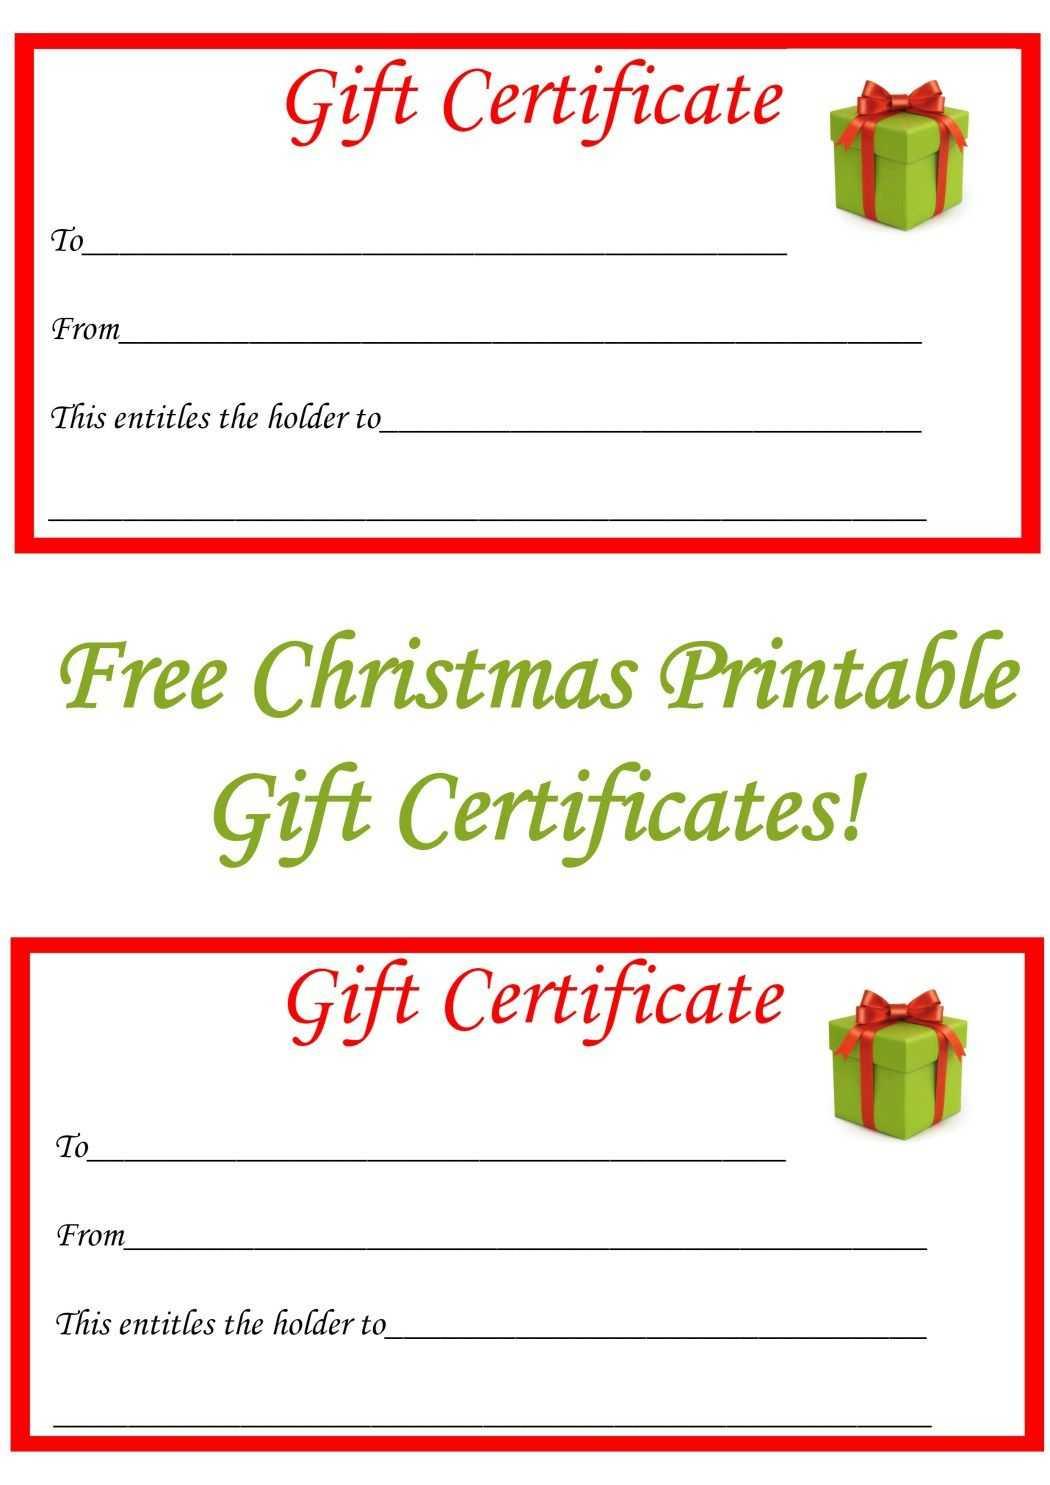 Free Christmas Printable Gift Certificates   Free Gift Throughout Free Christmas Gift Certificate Templates